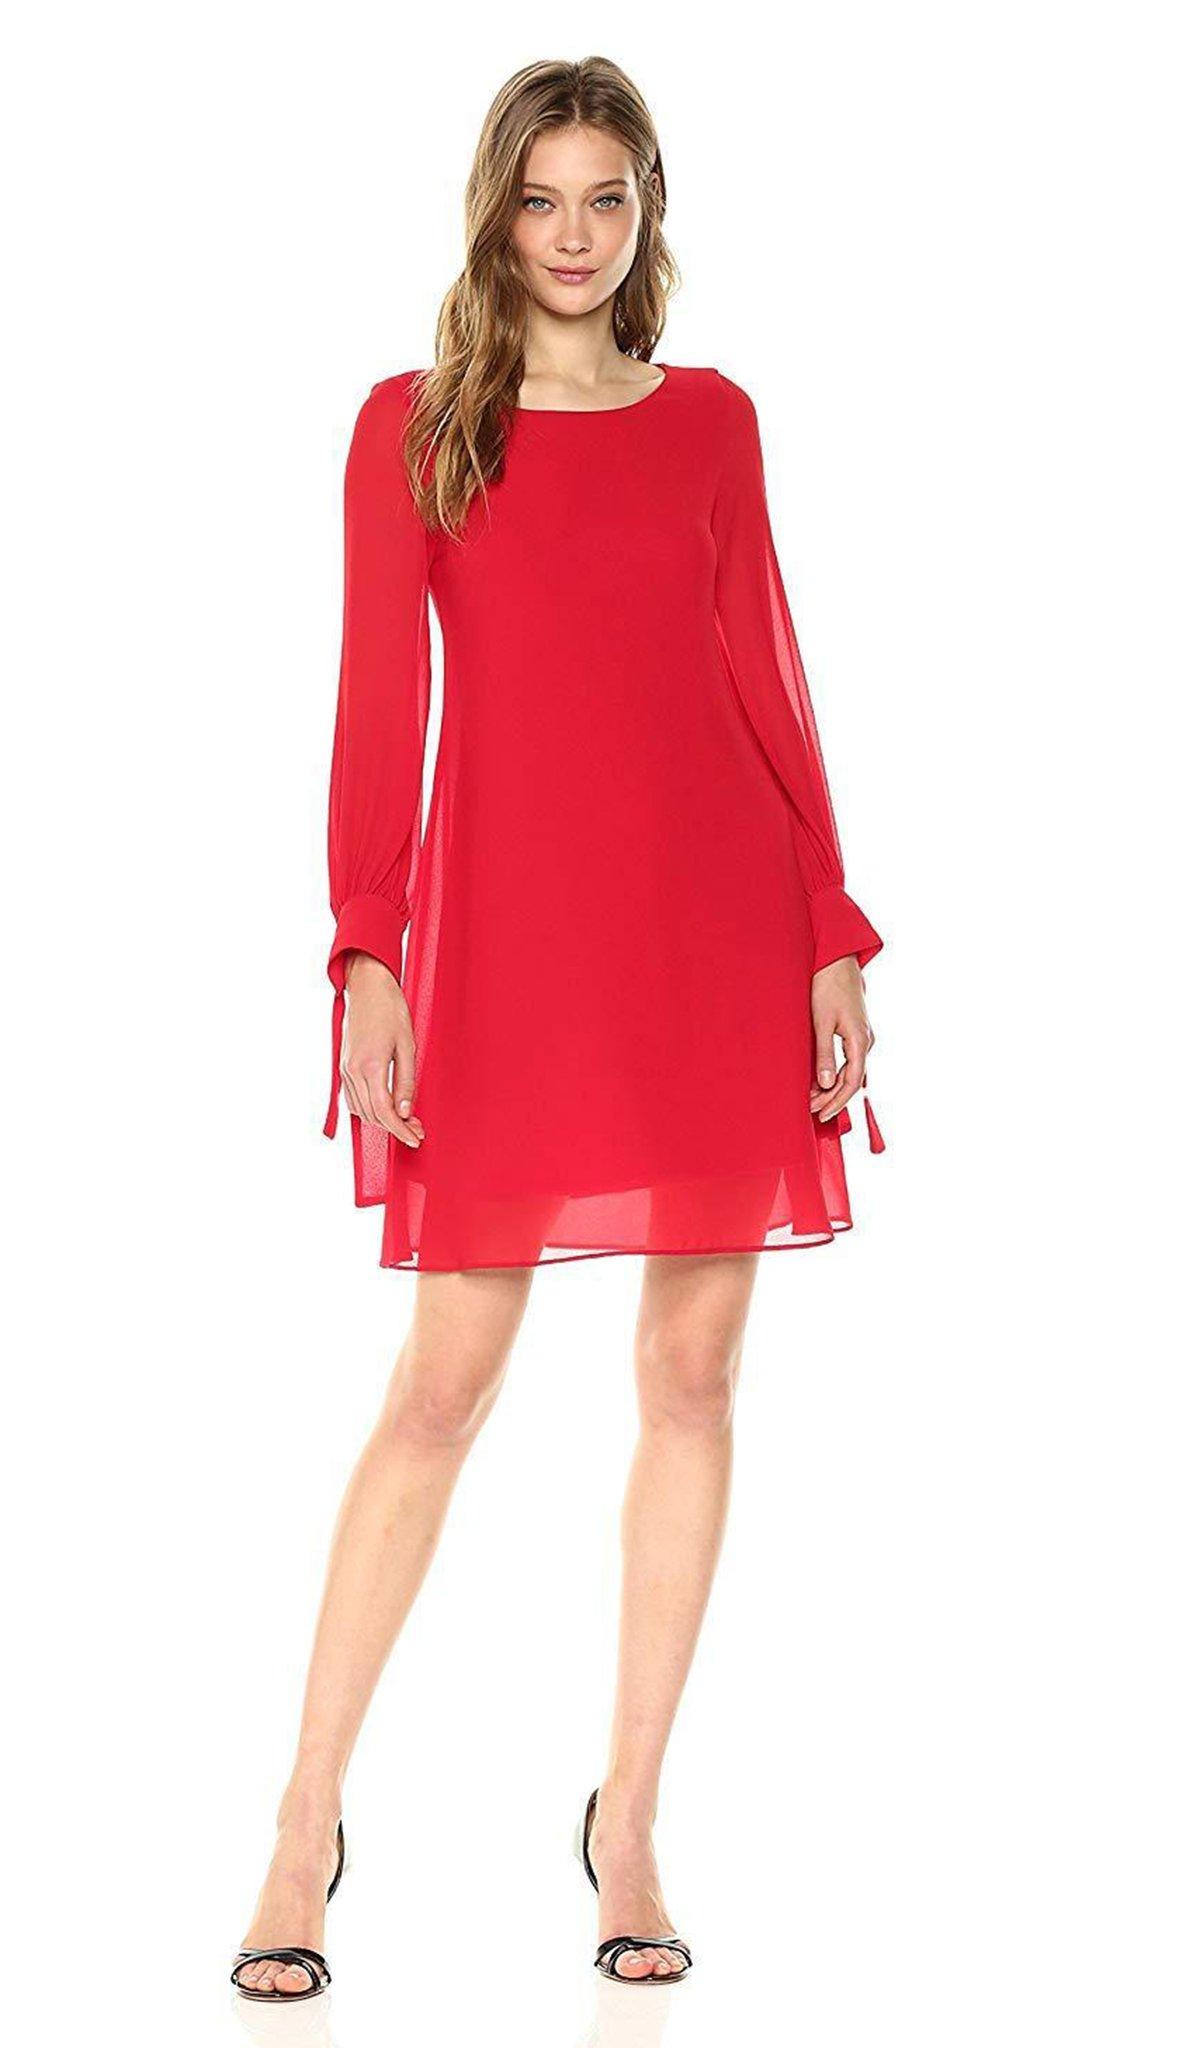 Taylor - 9146M Long Sleeve Scoop Neck A-line Dress